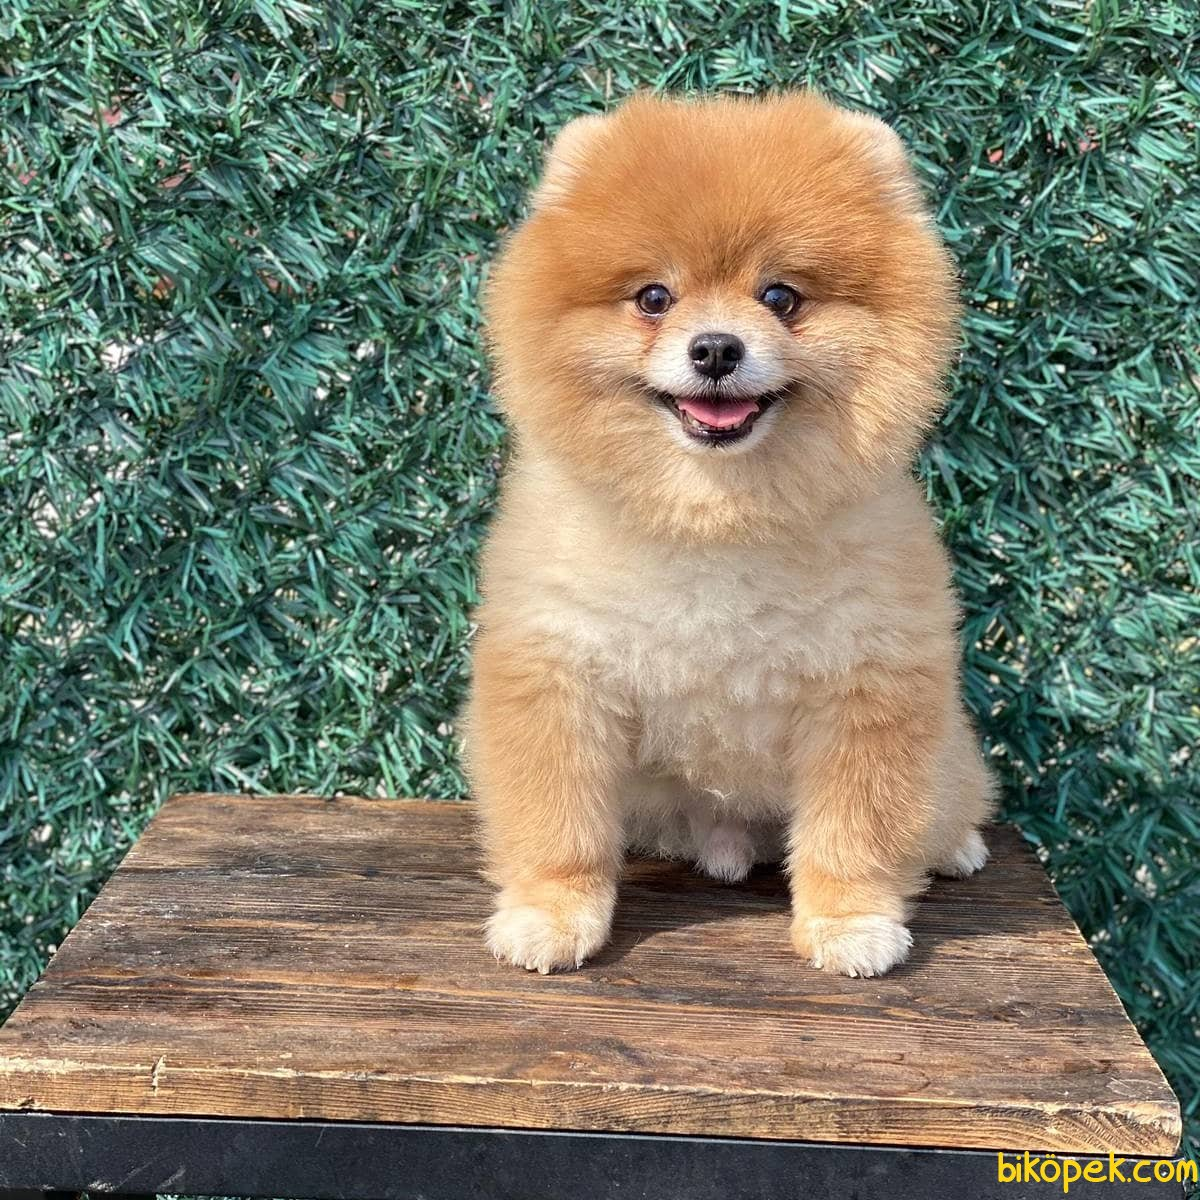 Scr Belgeli Orjinal Pomeranian Boo 3